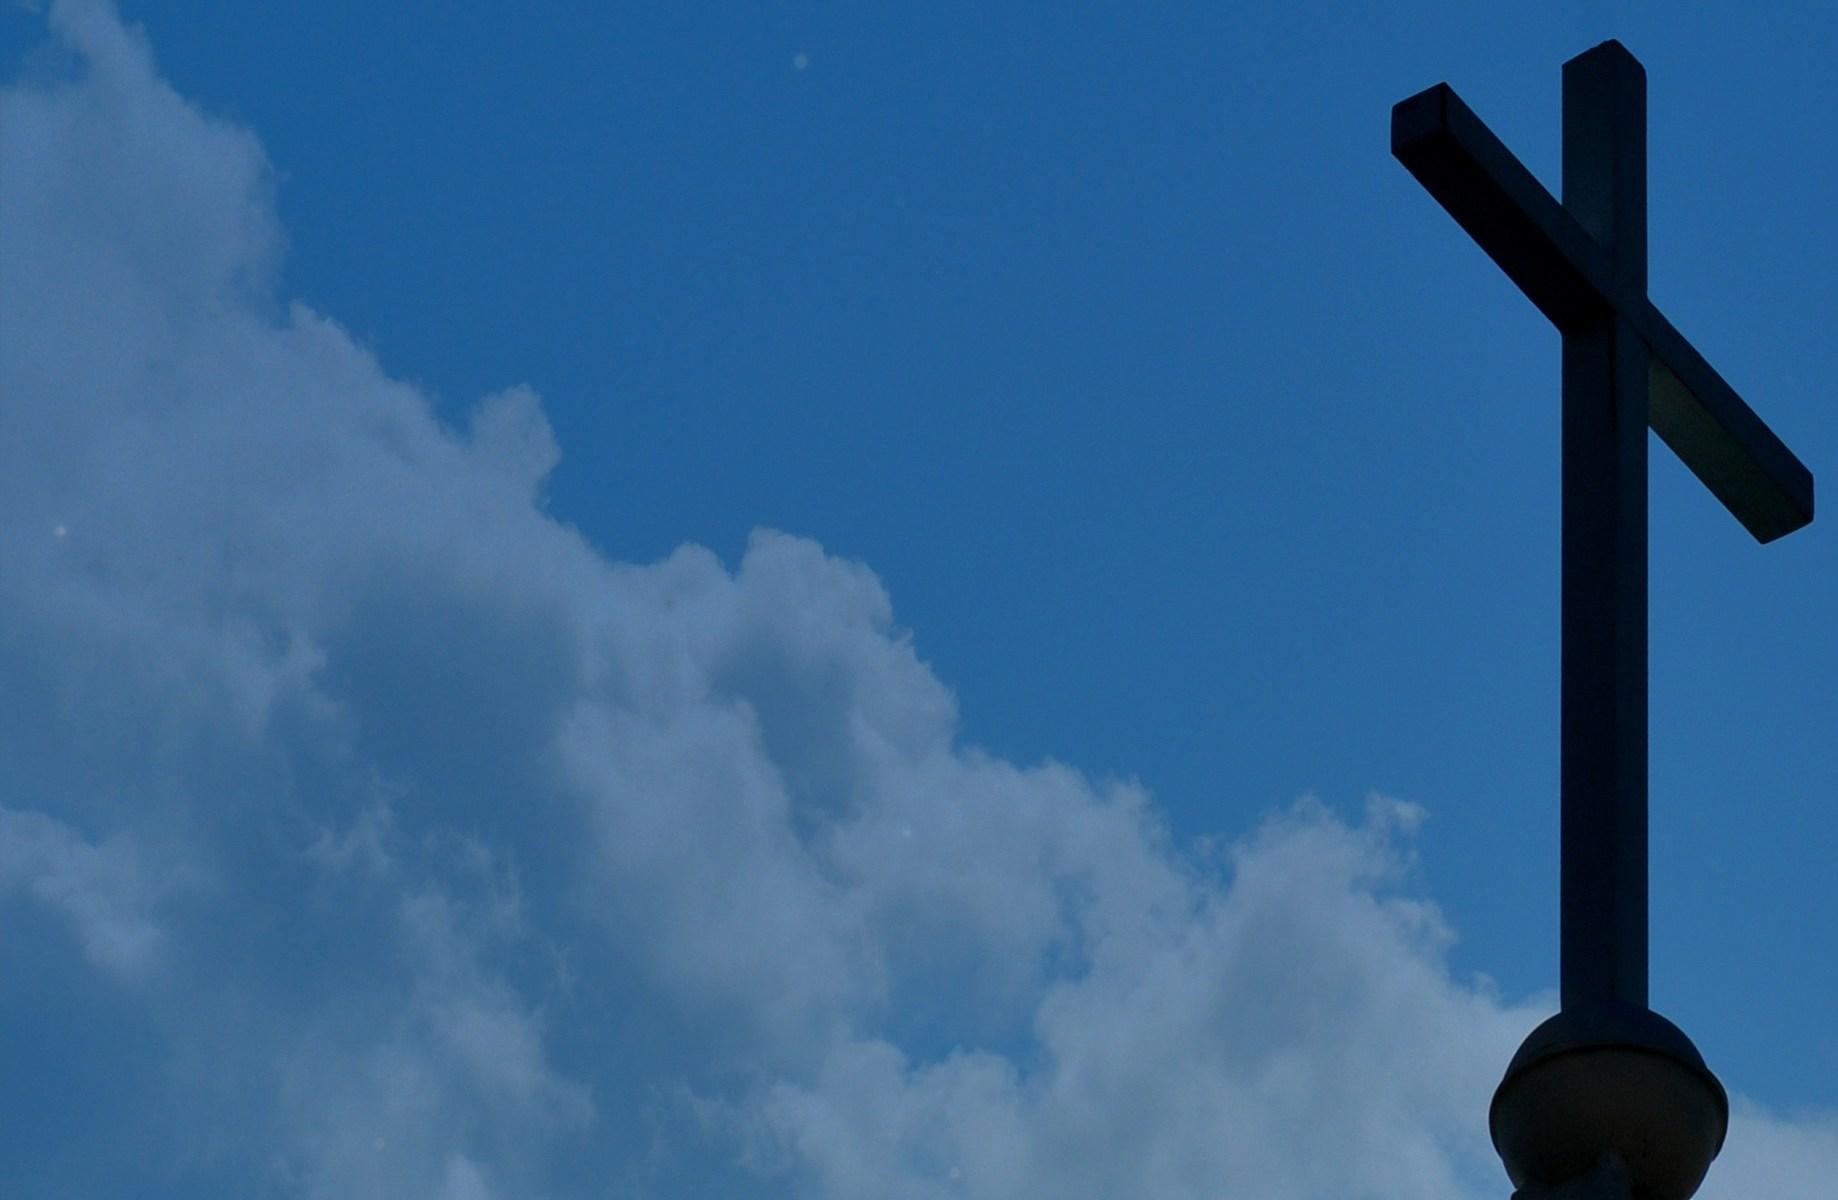 Black cross in a cloudy sky by alan ballou